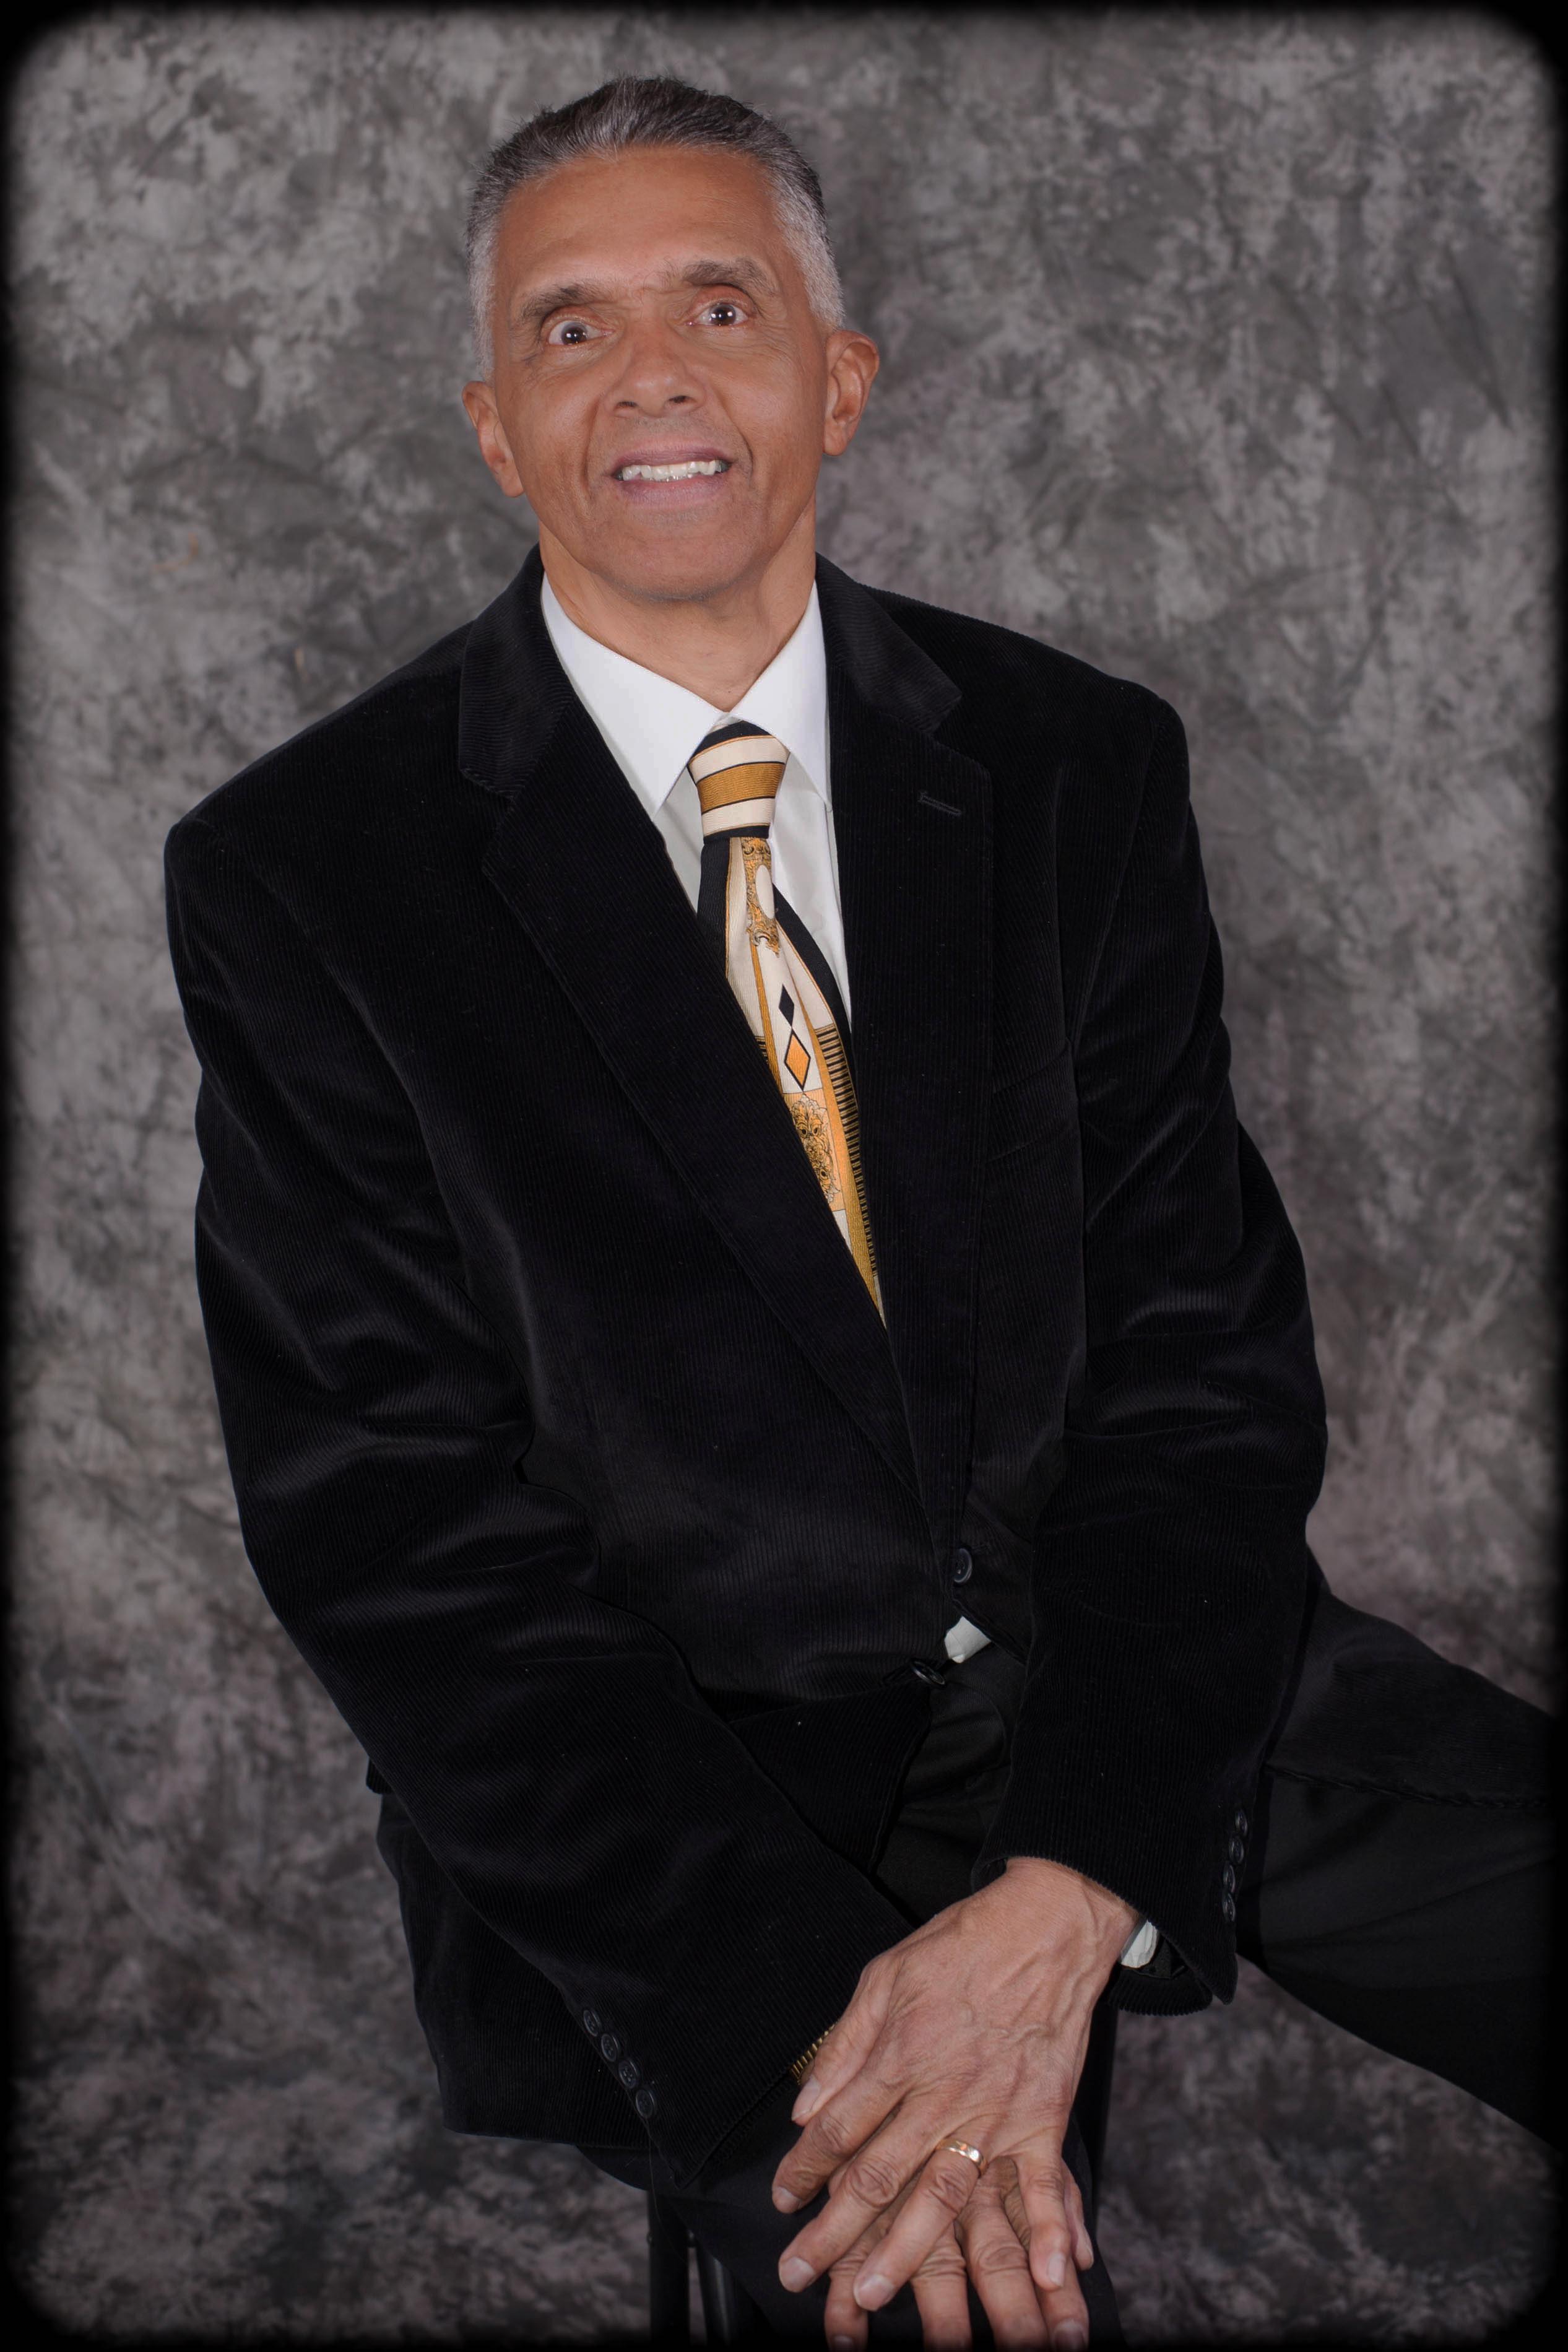 Pastor_Dan_Shields